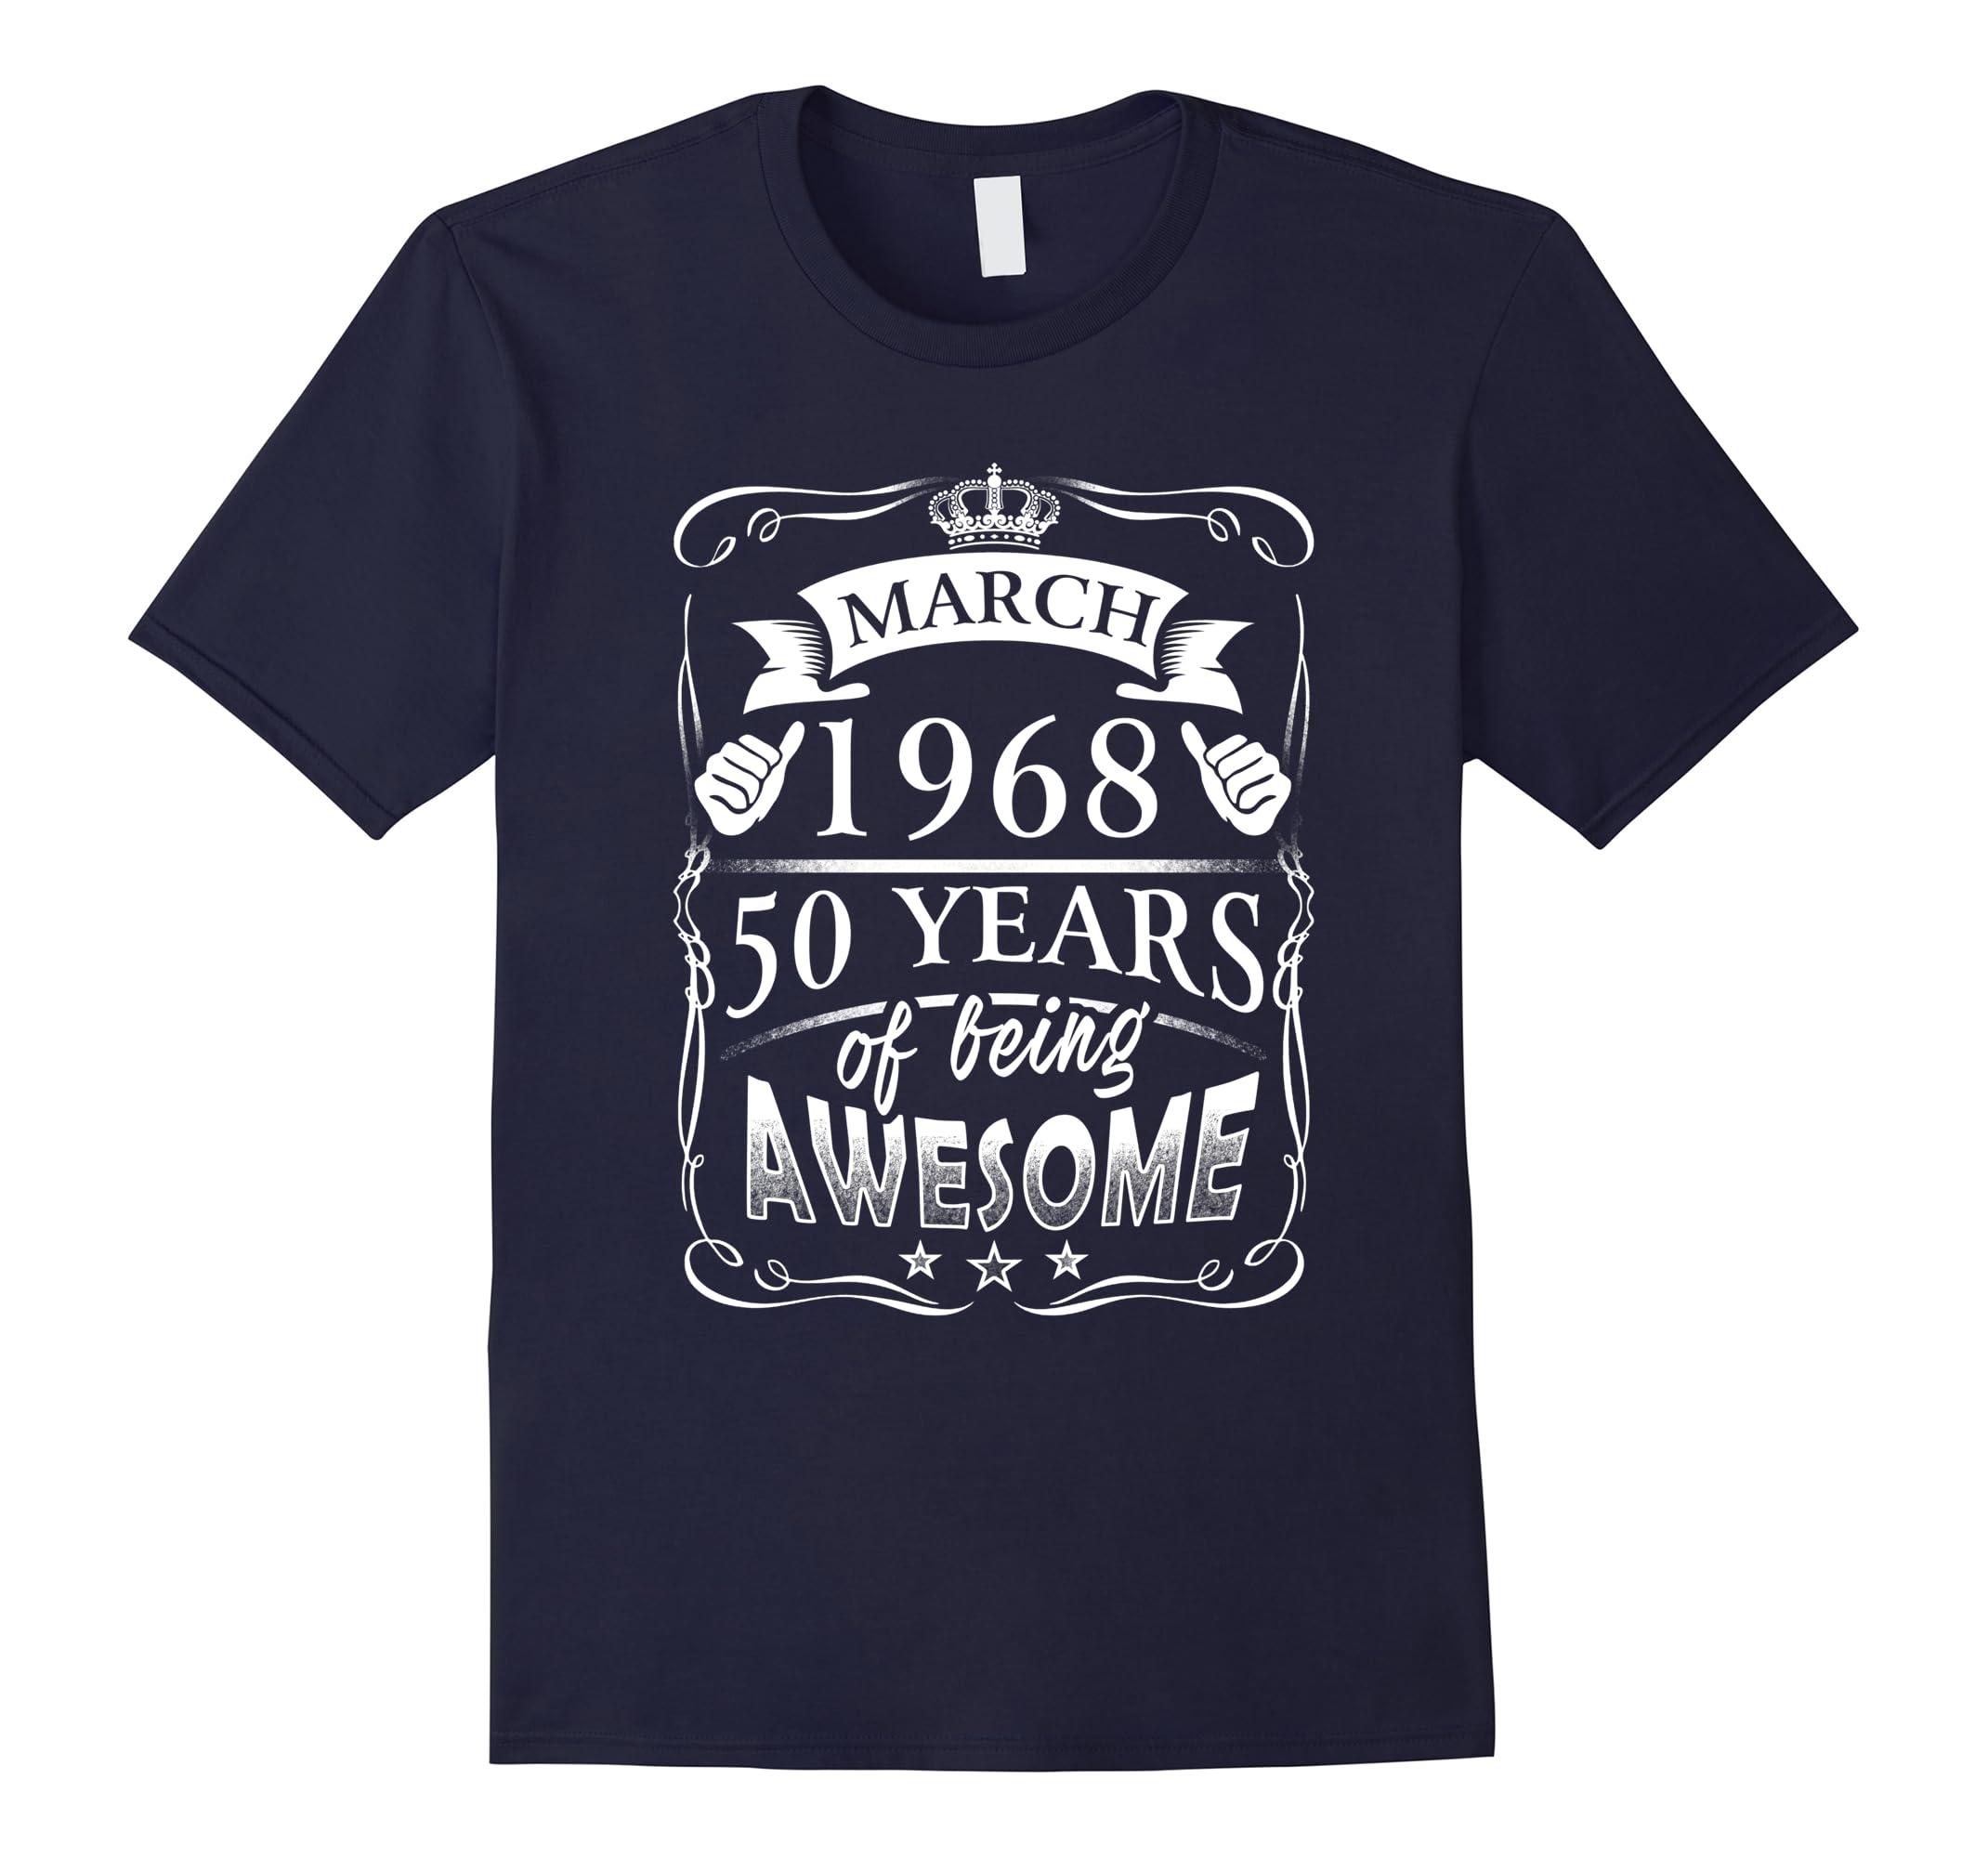 50th Birthday Gift - Born in March 1968 Shirt-ah my shirt one gift